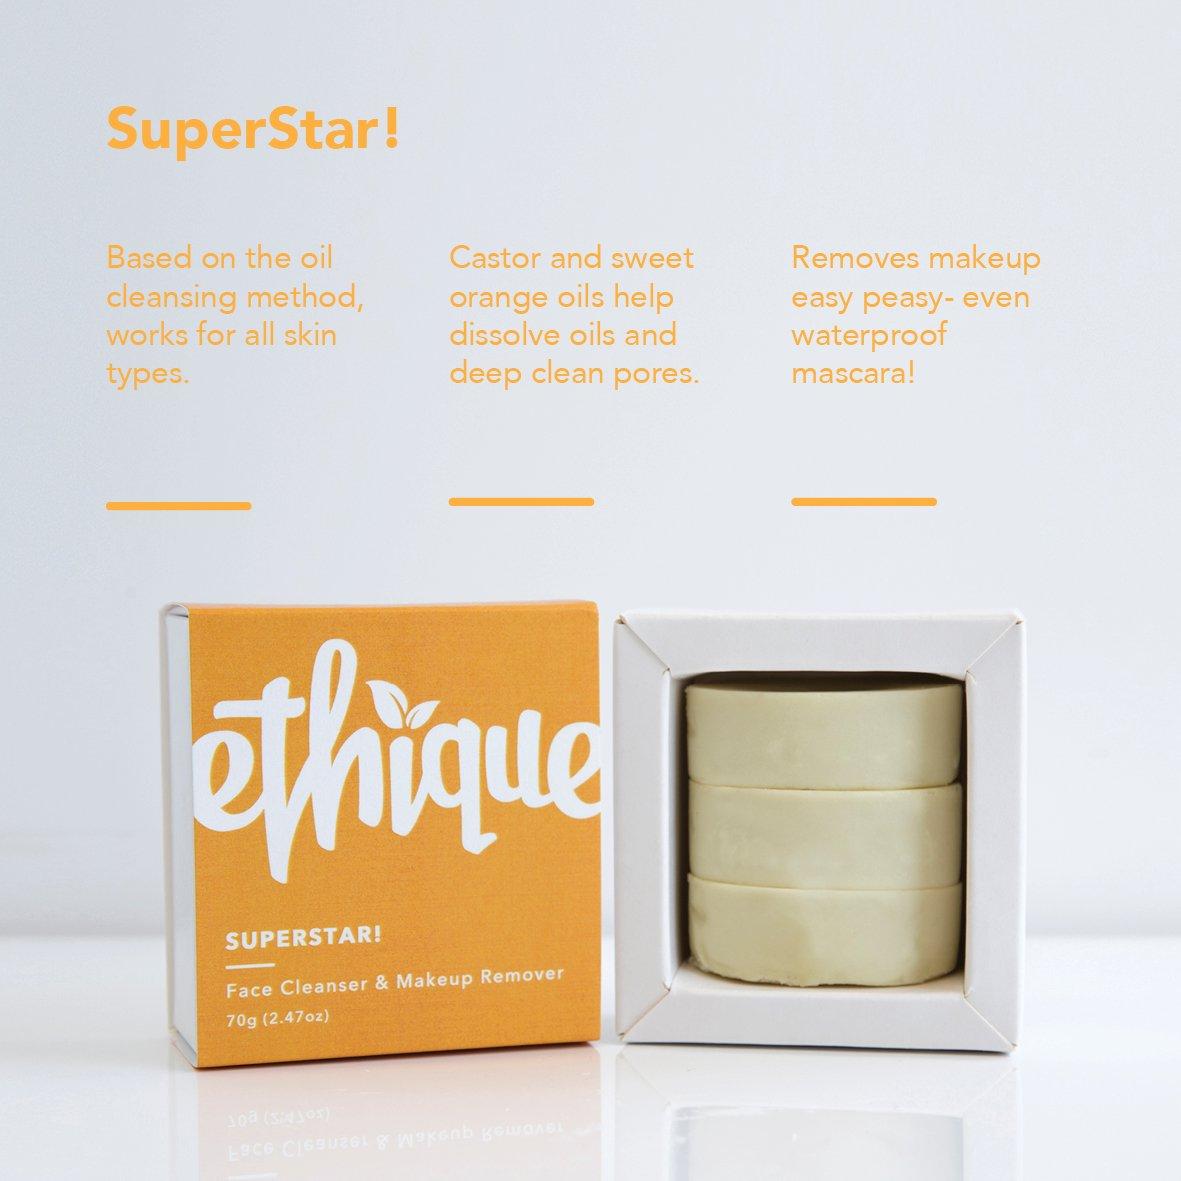 Ethique Face Cleanser & Makeup Remover, SuperStar! 2.47 oz by Ethique (Image #7)